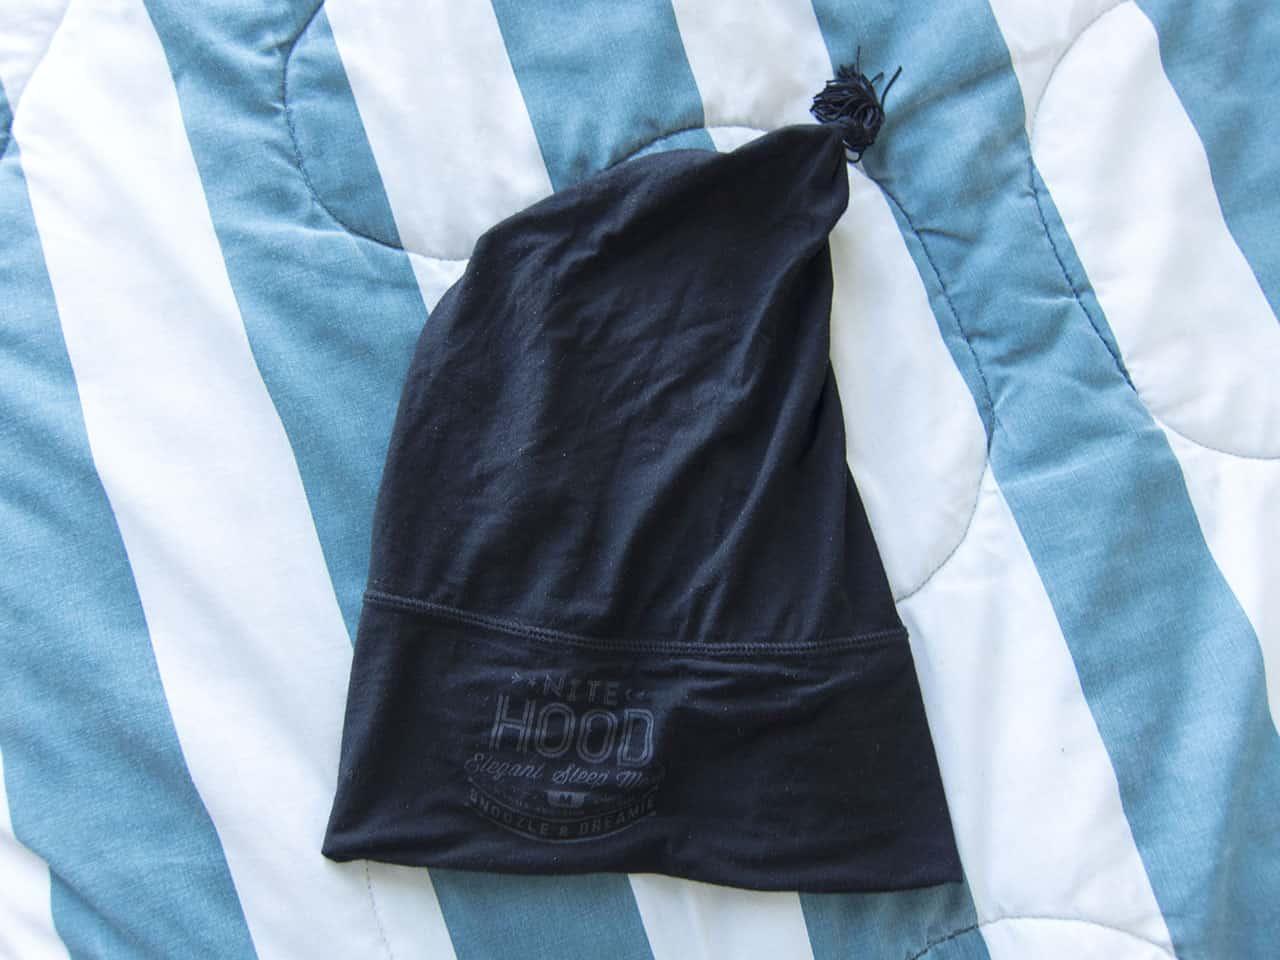 nite-hood-on-bed